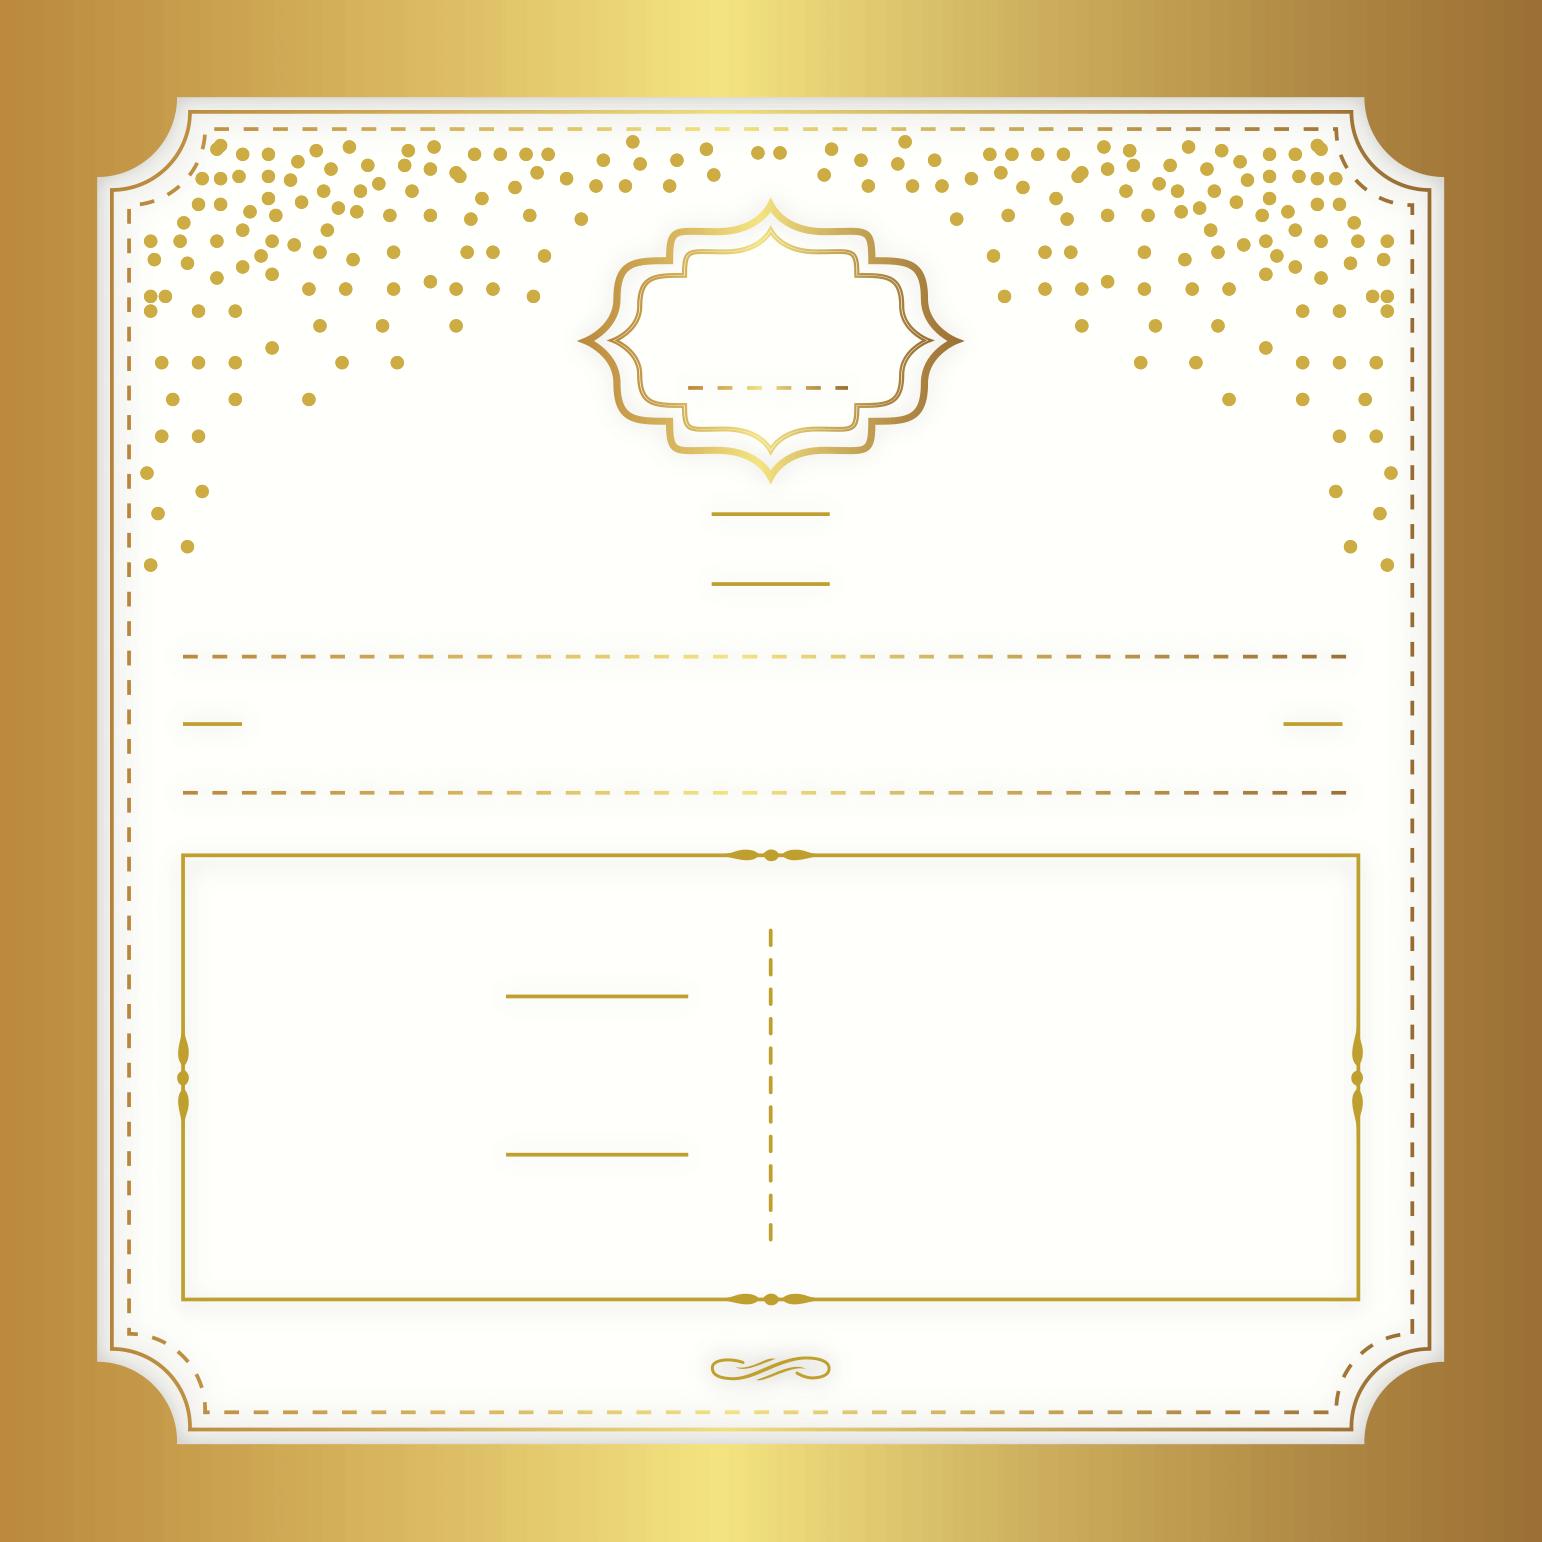 Gold elegant free printable wedding invitation template gold elegant free printable wedding invitation template greetings island kristyandbryce Choice Image